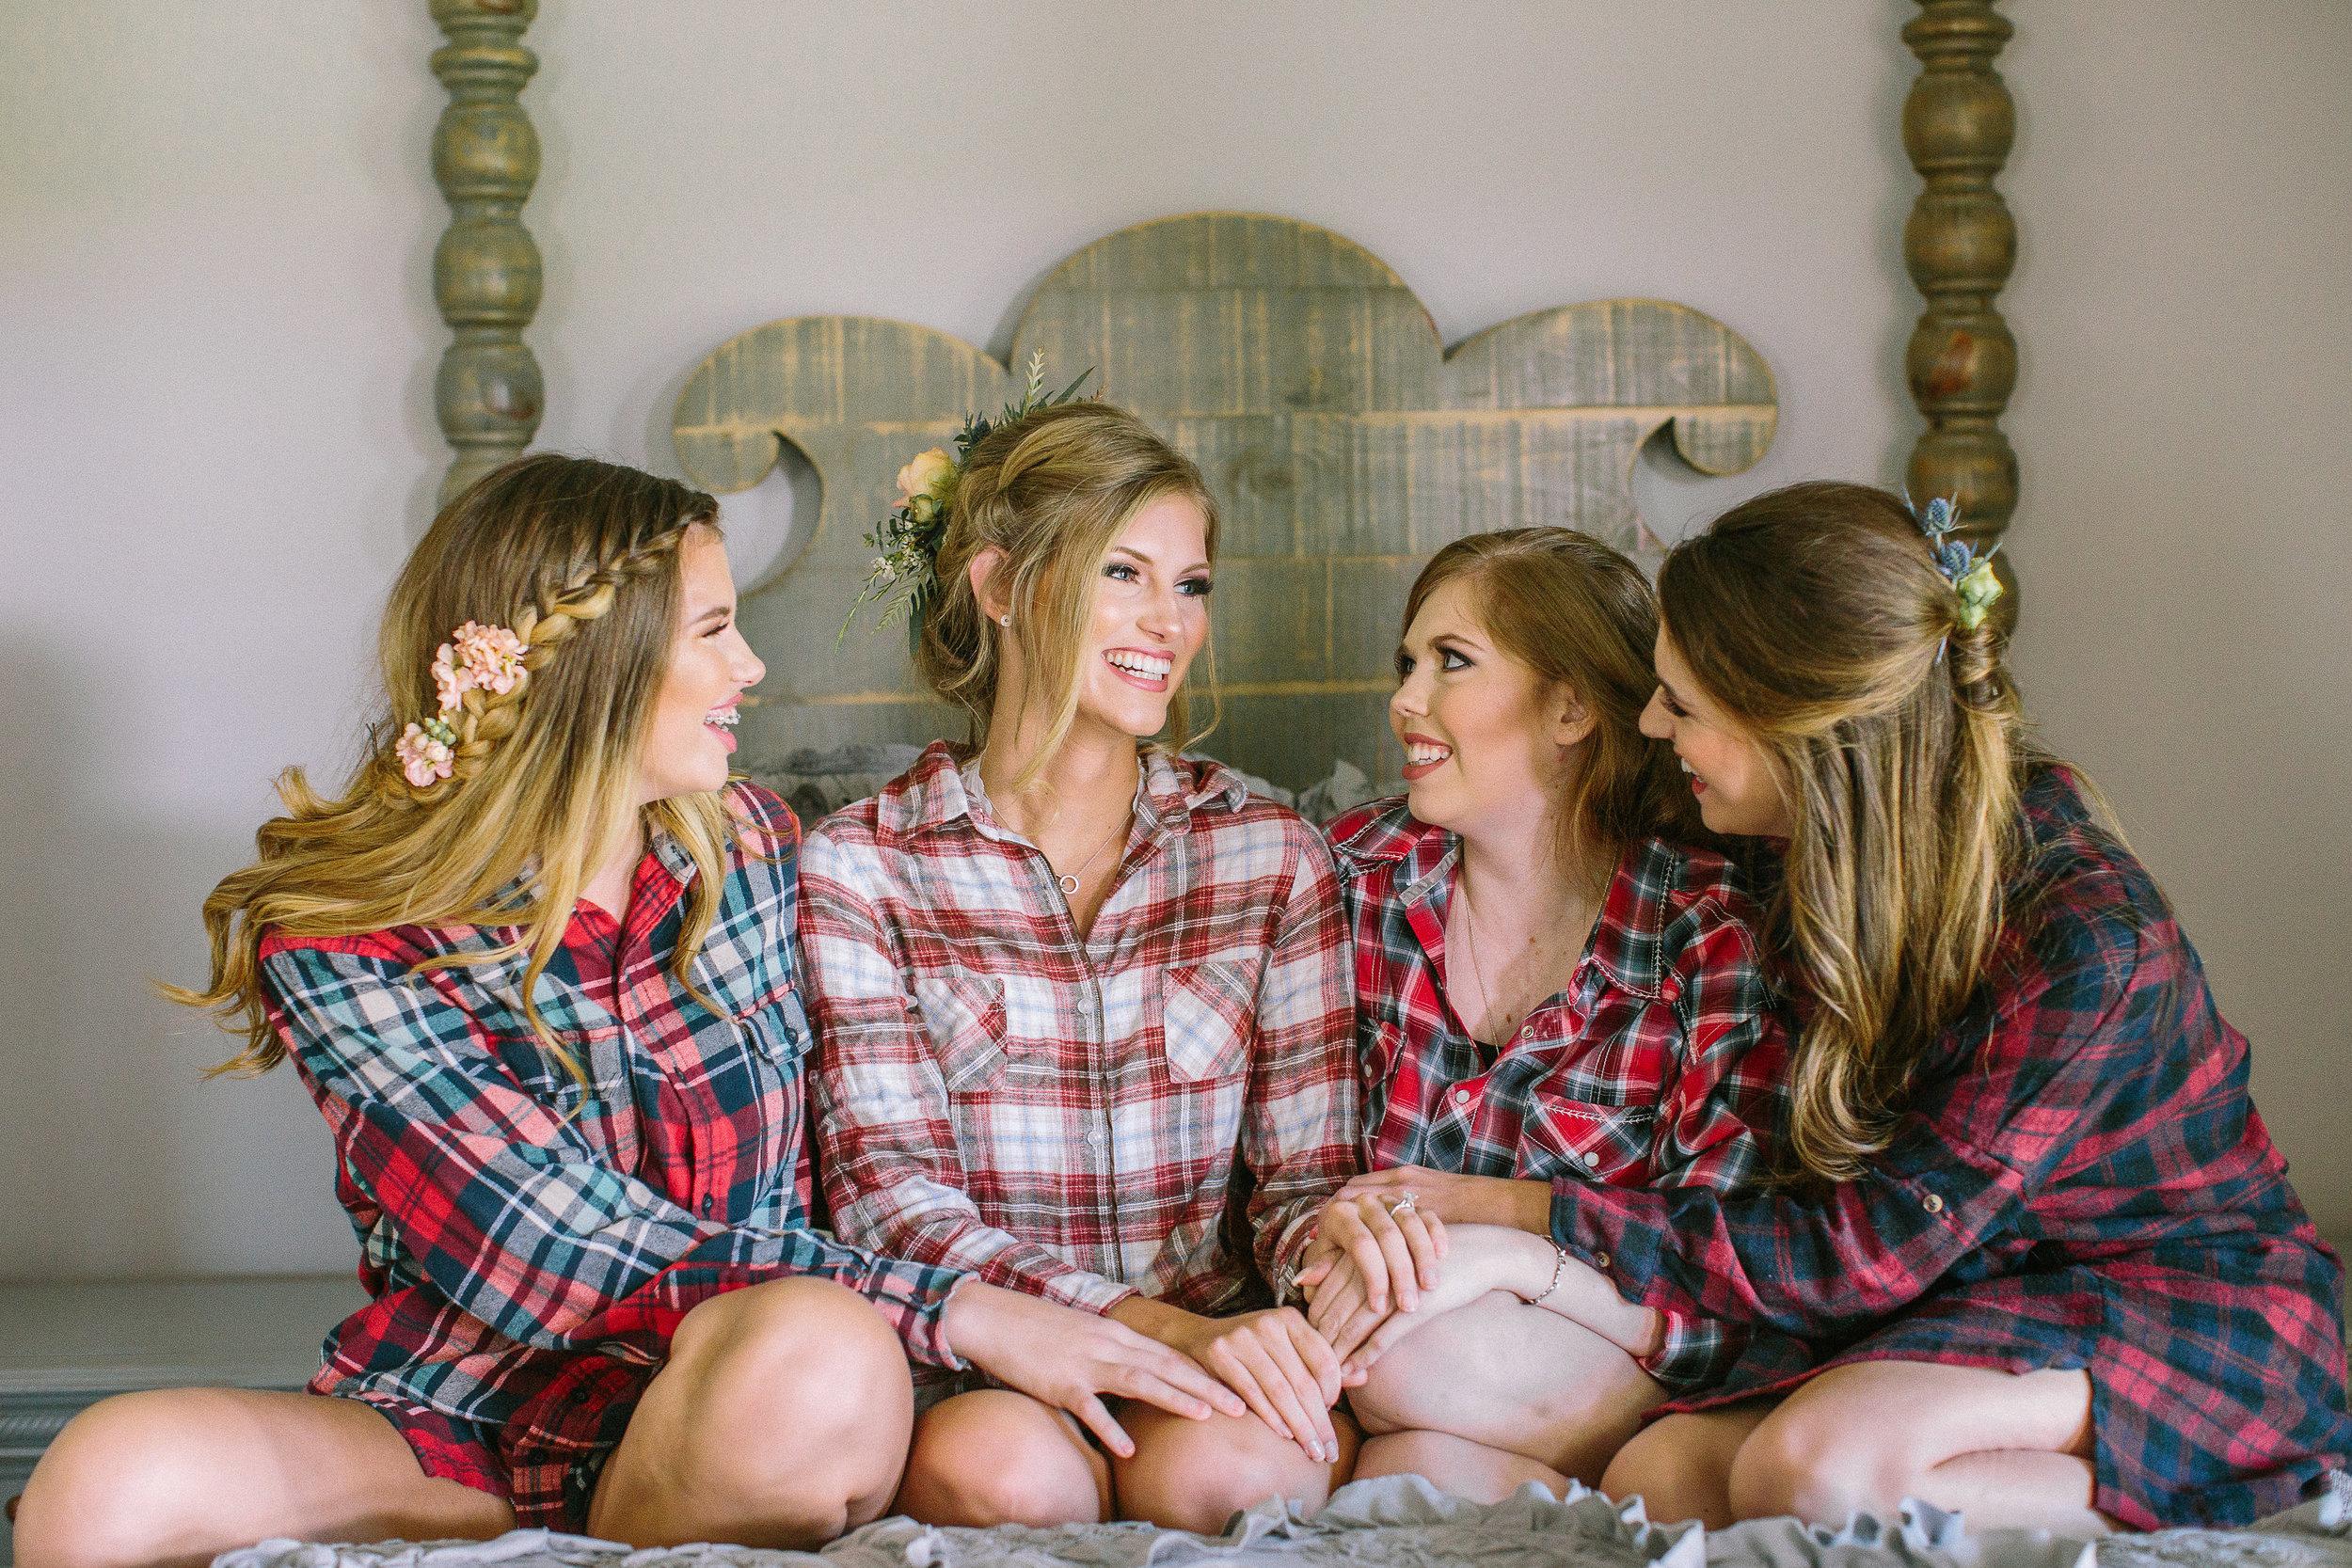 Ellen-Ashton-Photography-Peach-Creek-Ranch-Weddings-Wed-and-Prosper21.jpg